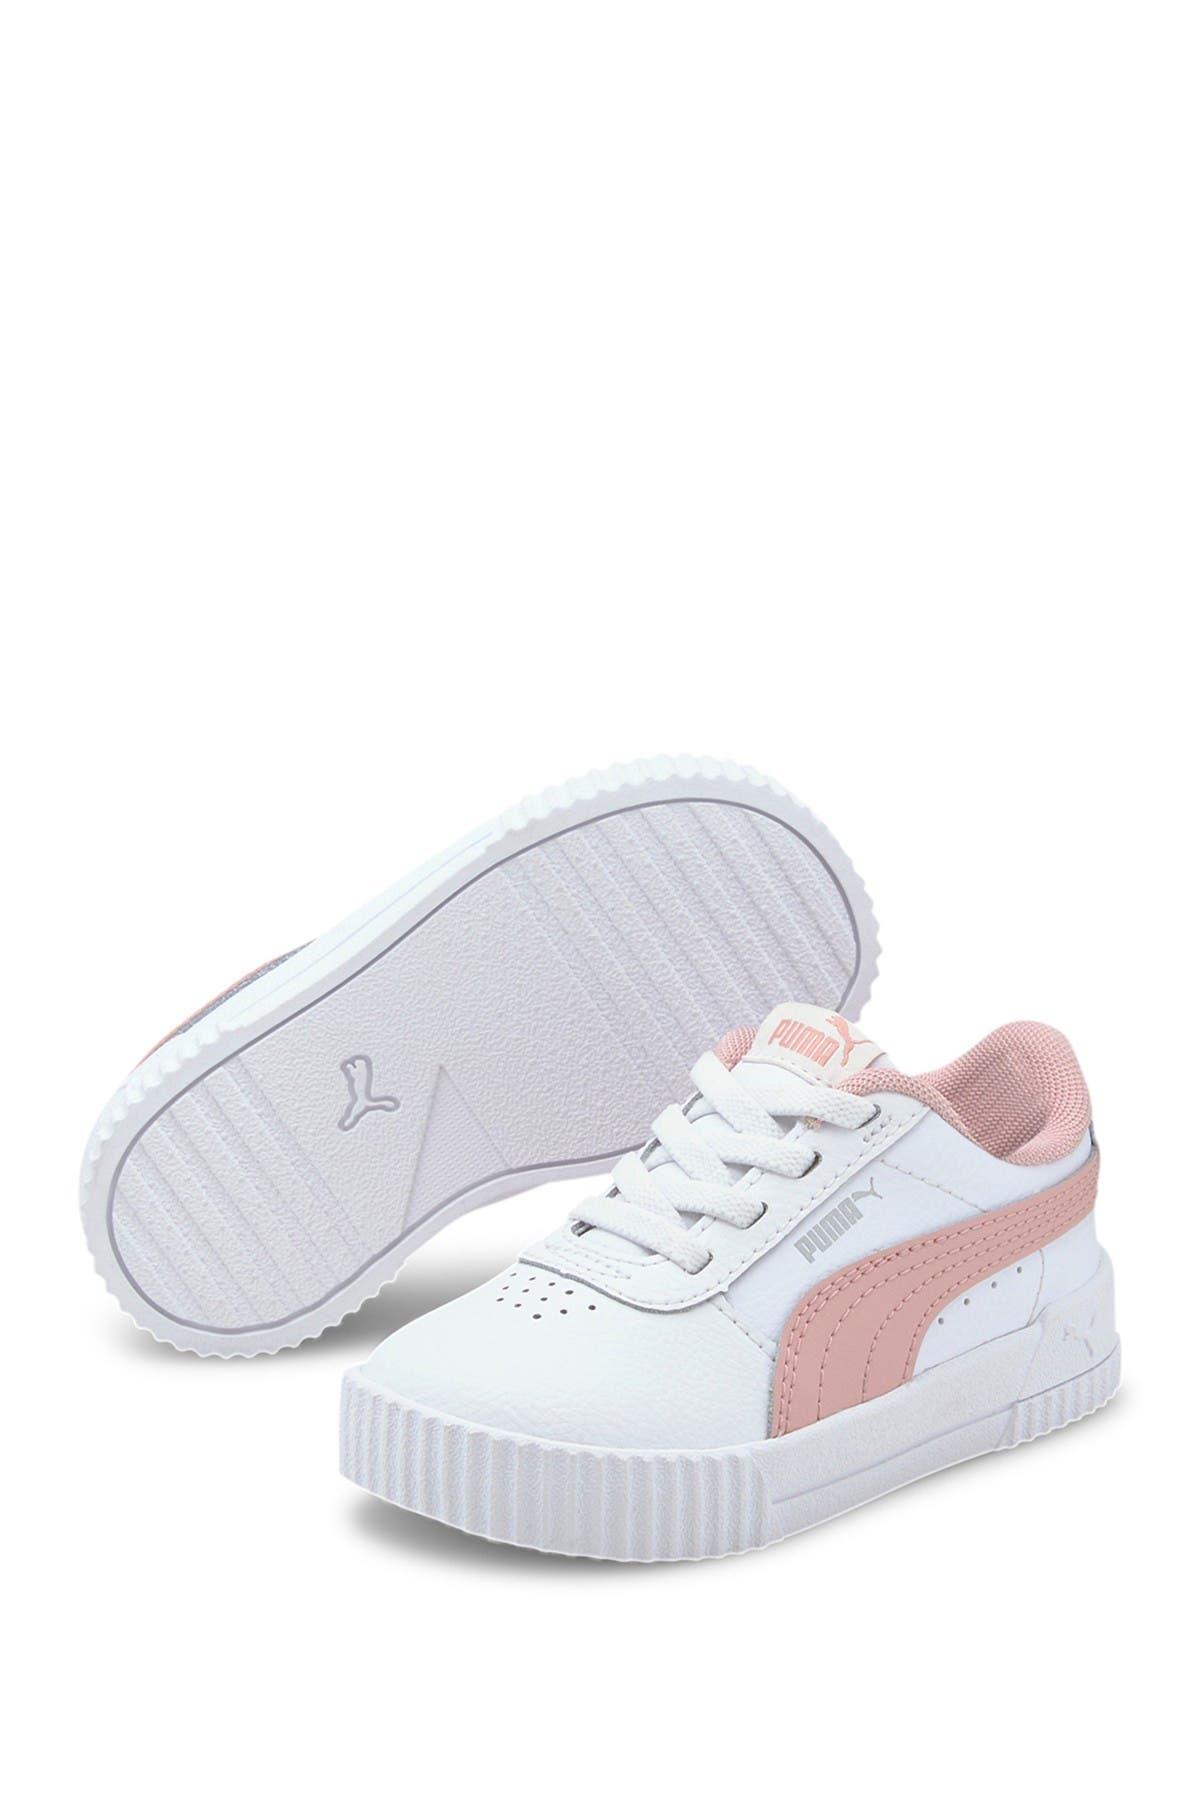 Image of PUMA Carina L Sneaker